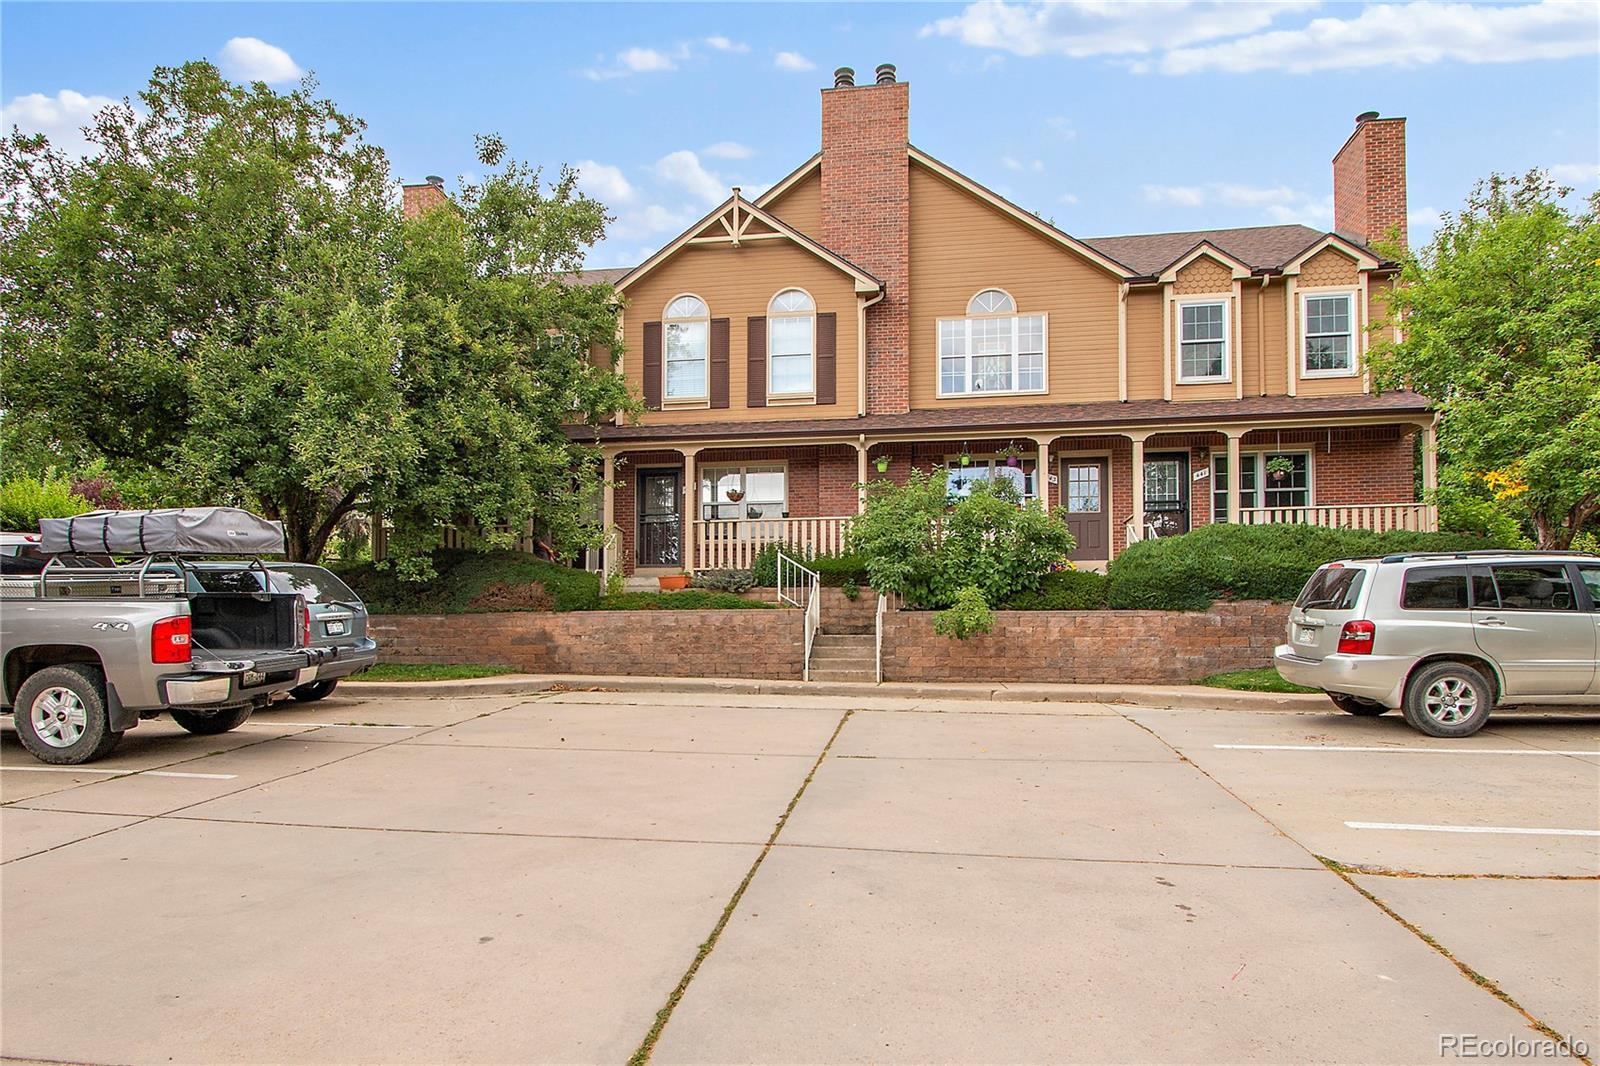 449 Pheasant Run Property Photo - Louisville, CO real estate listing